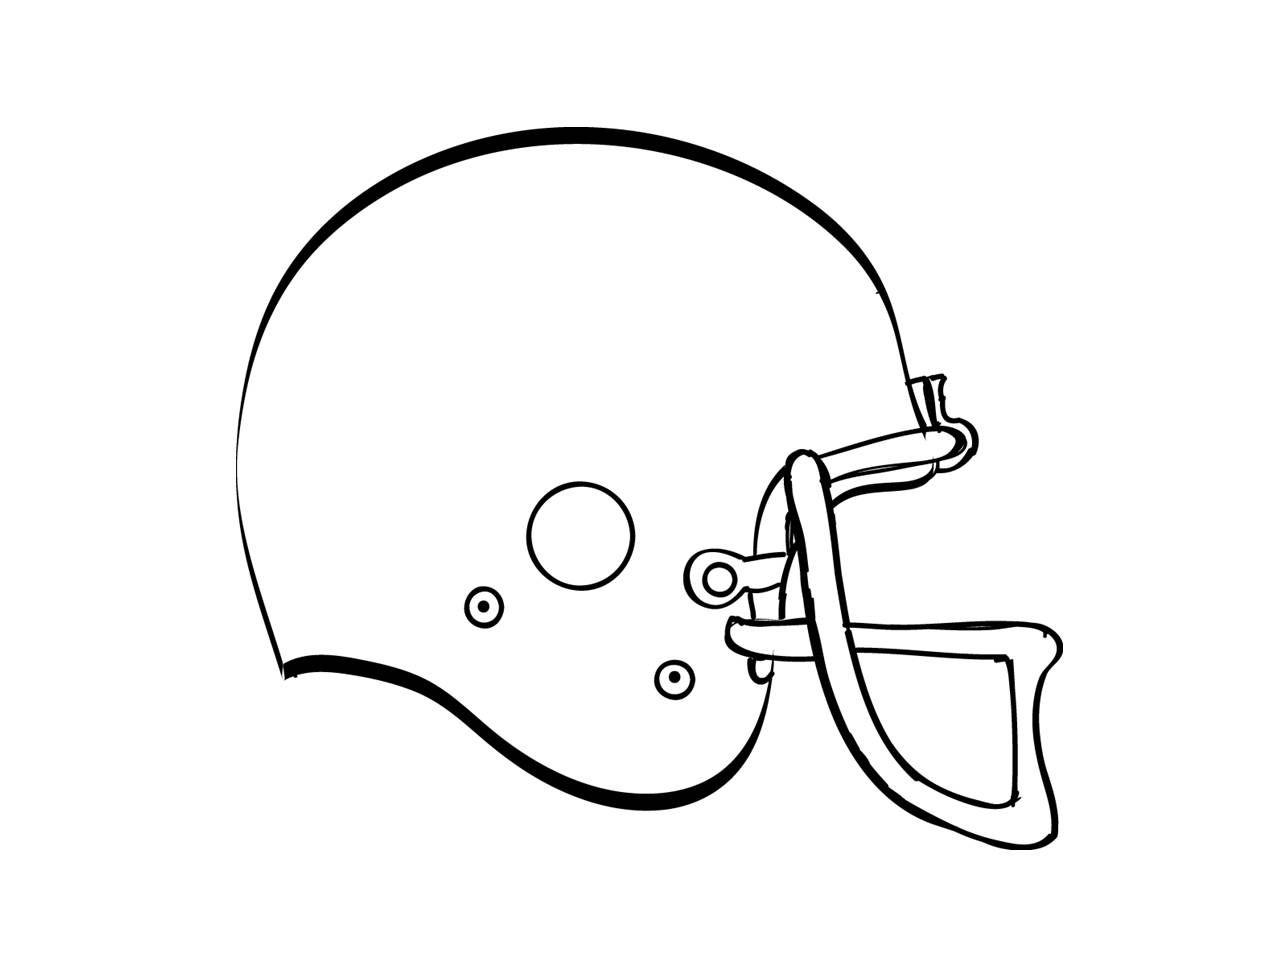 Football helmet clip art free clipart images image 2.